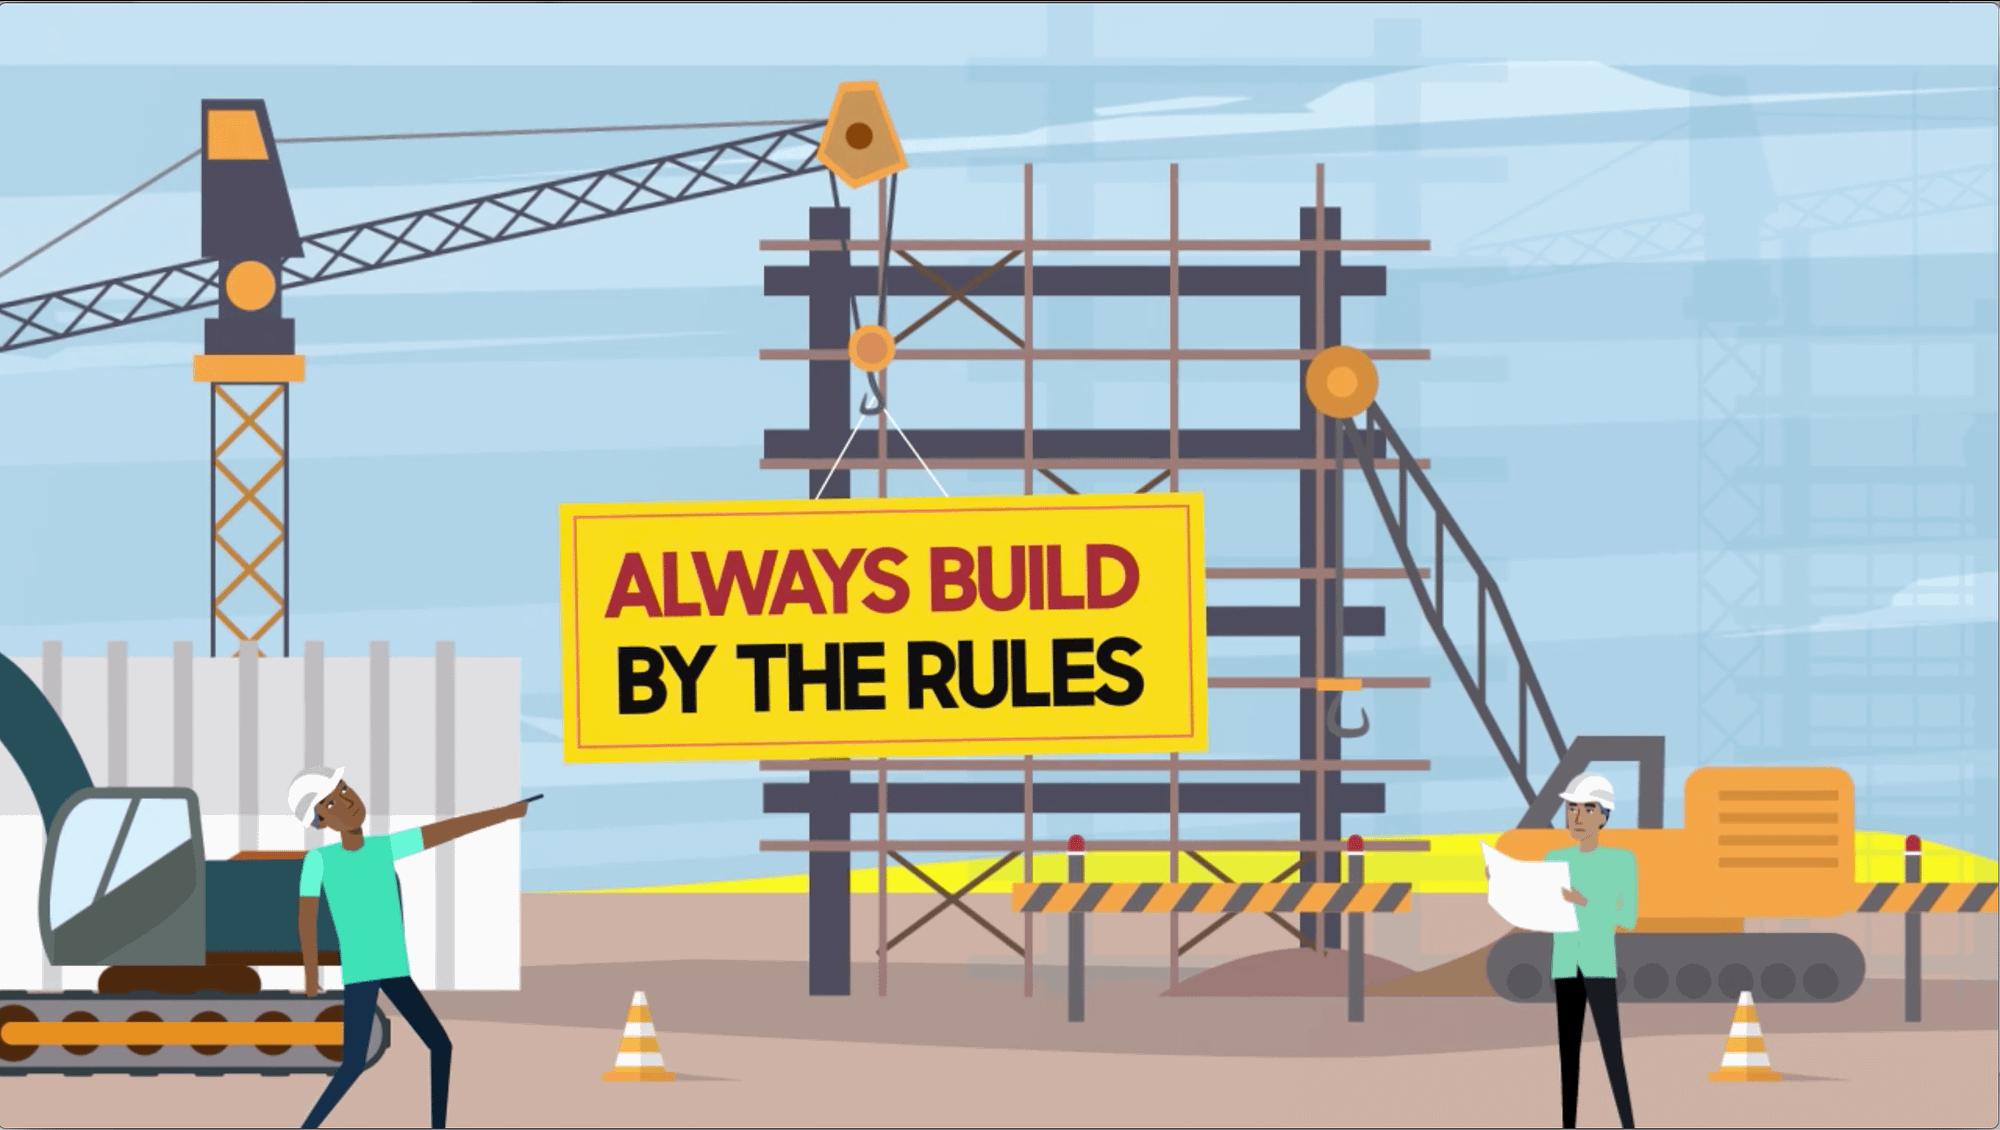 Illustration about building contractors